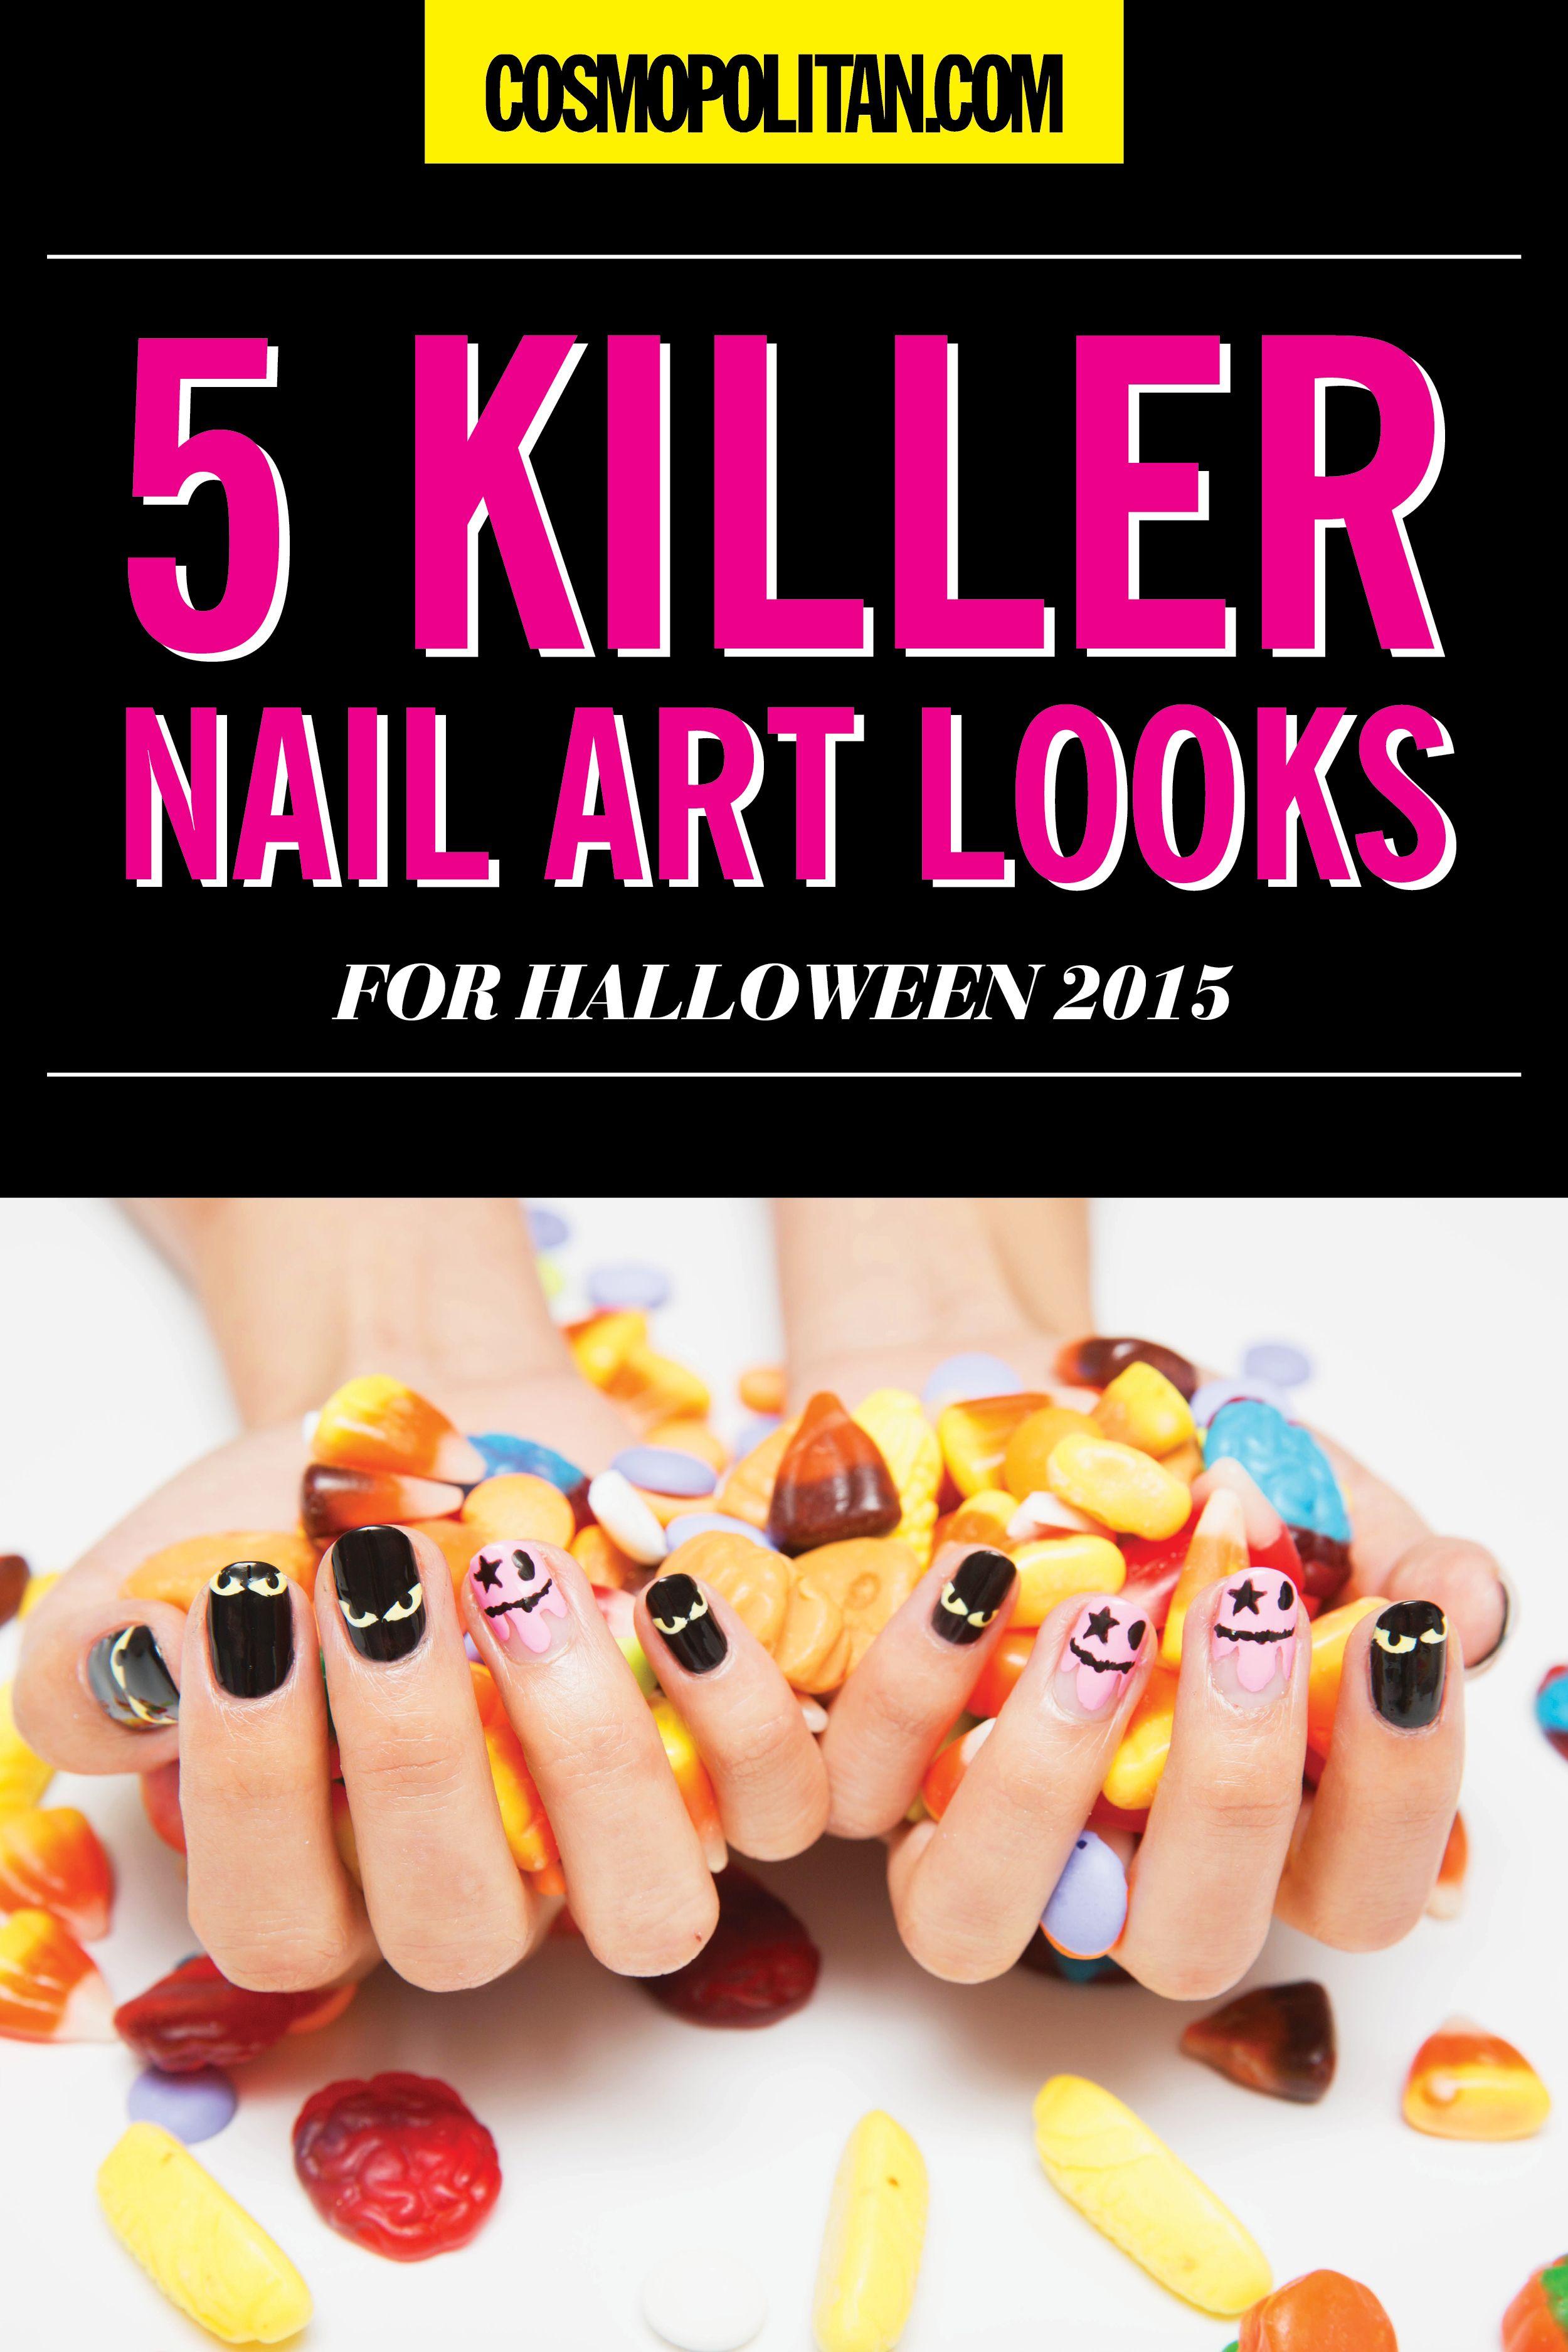 Halloween Nail Art 2015 - 5 Killer Nail Art Ideas for Halloween 2015